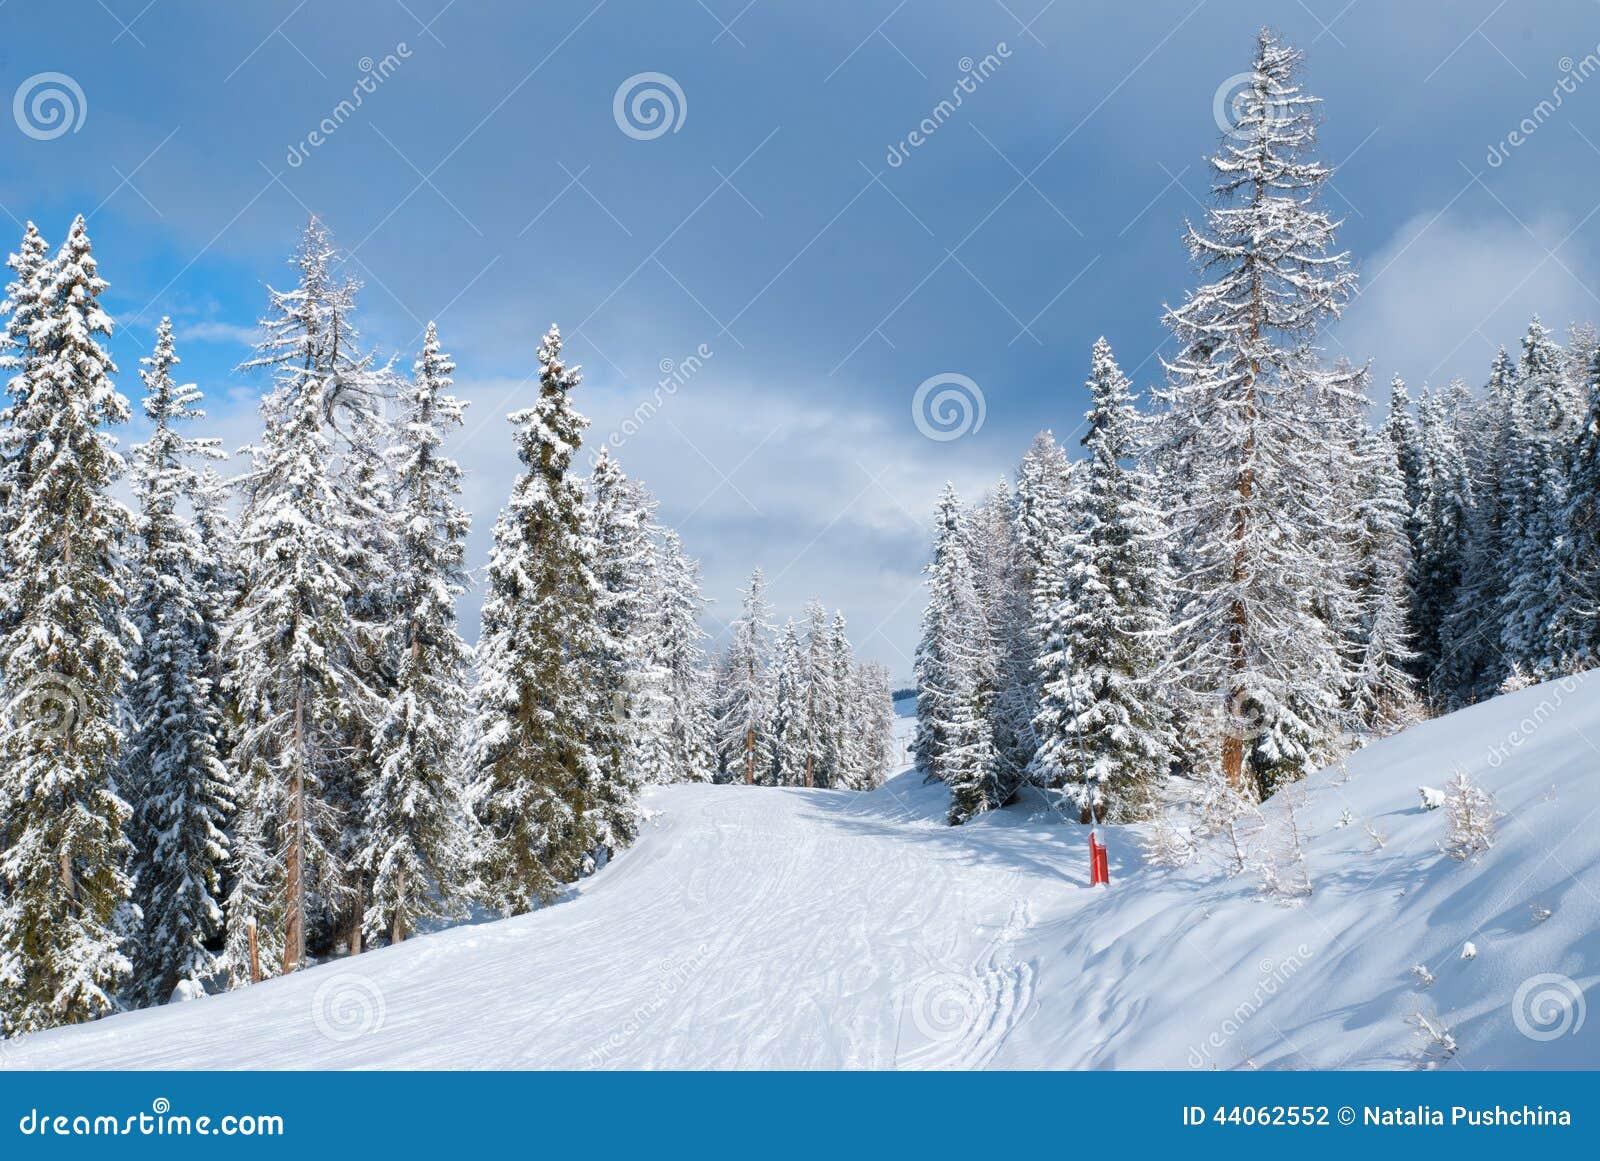 beau paysage d 39 hiver avec des sapins photo stock image 44062552. Black Bedroom Furniture Sets. Home Design Ideas